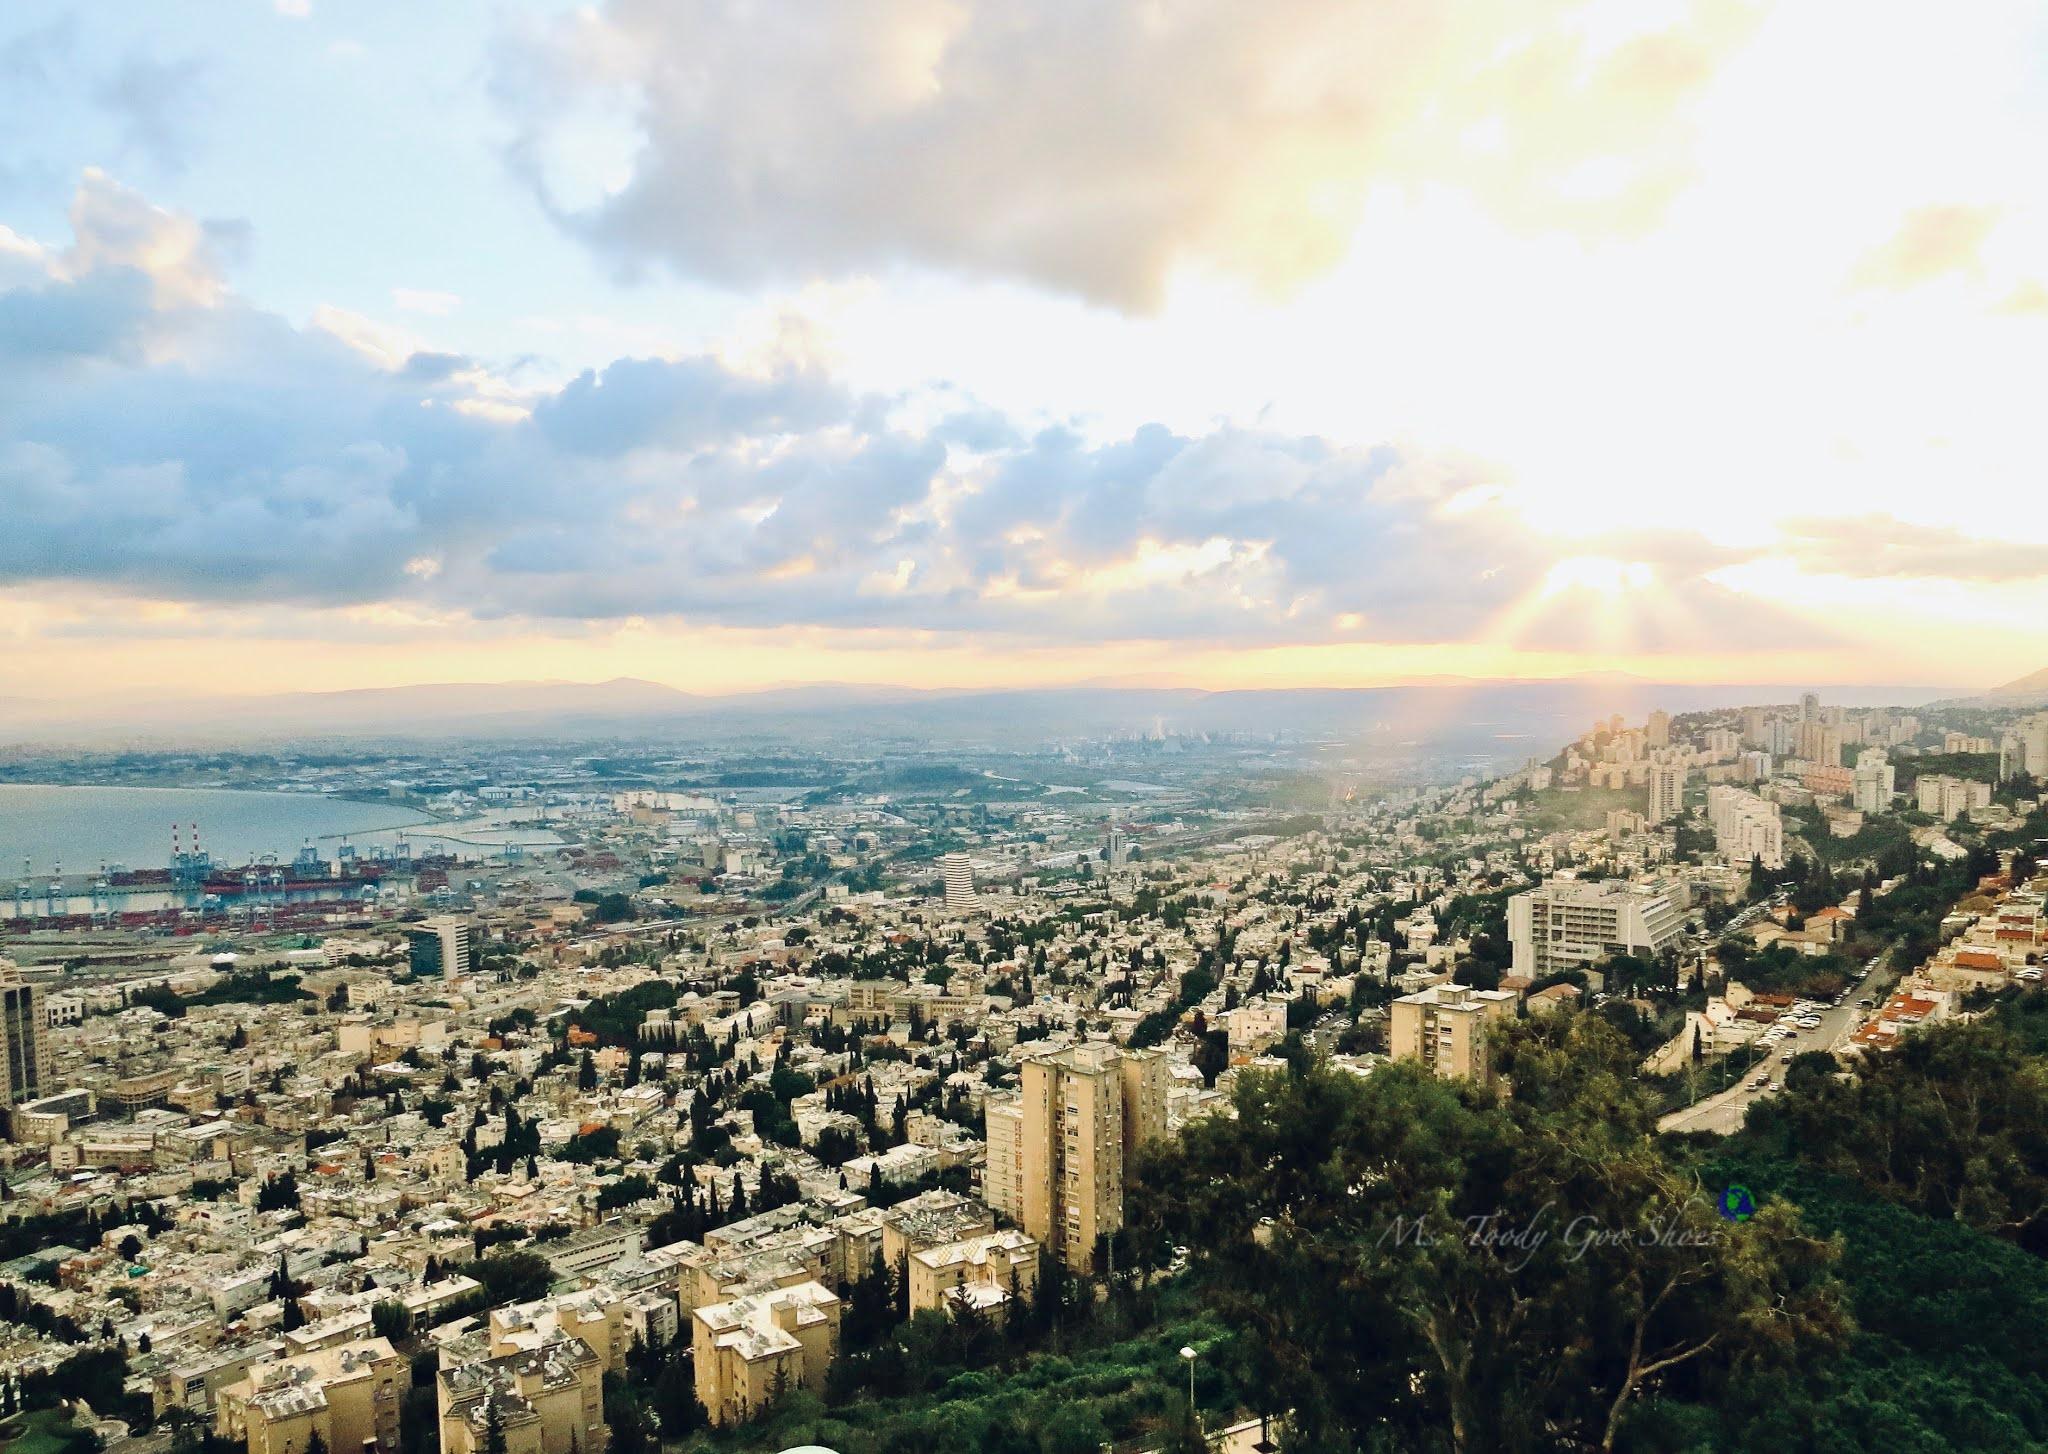 Daybreak in Haifa, Israel-  Ms. Toody Goo Shoes